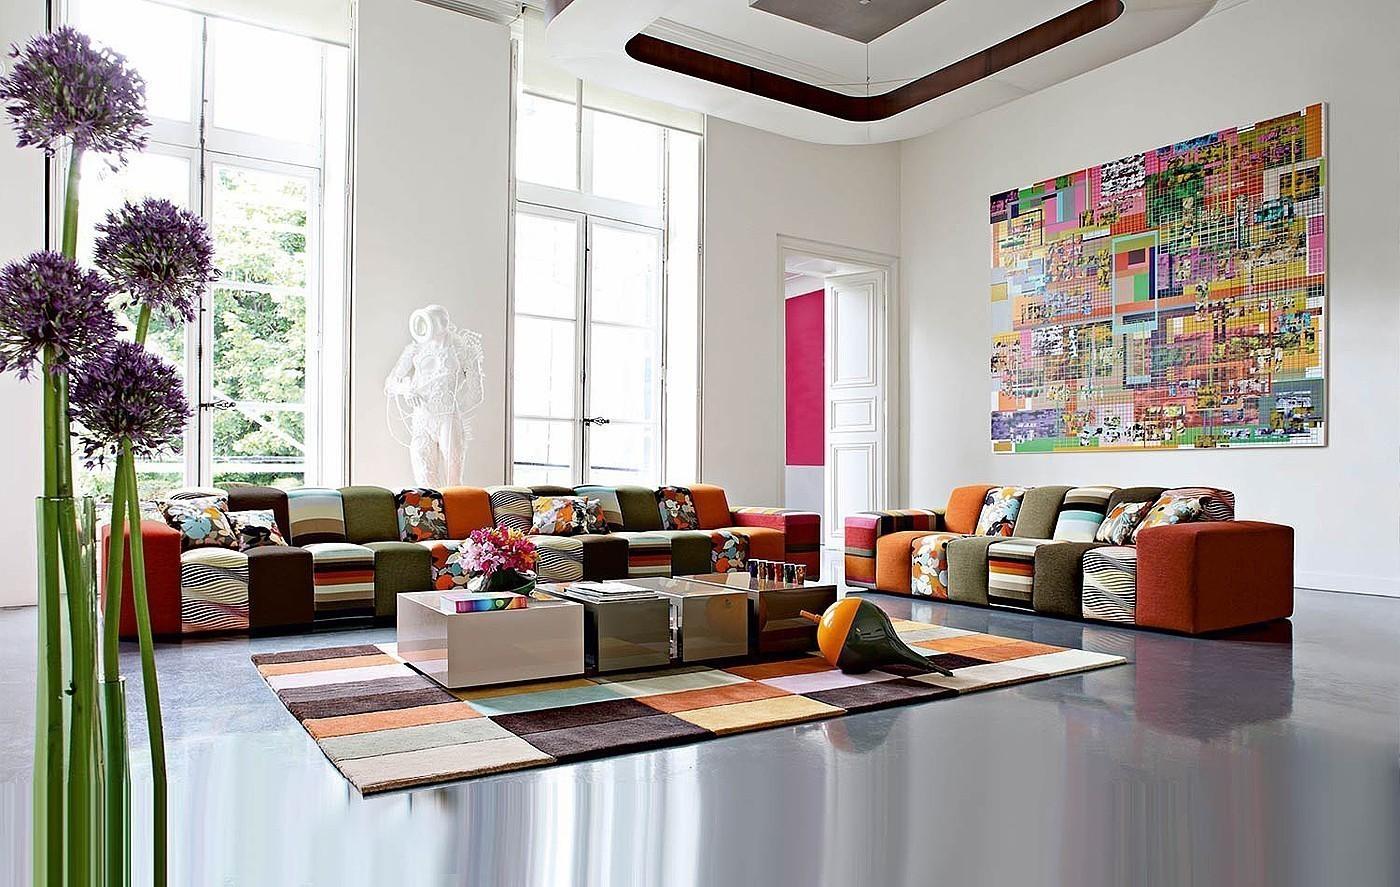 Дизайн интерьера в стиле авангард